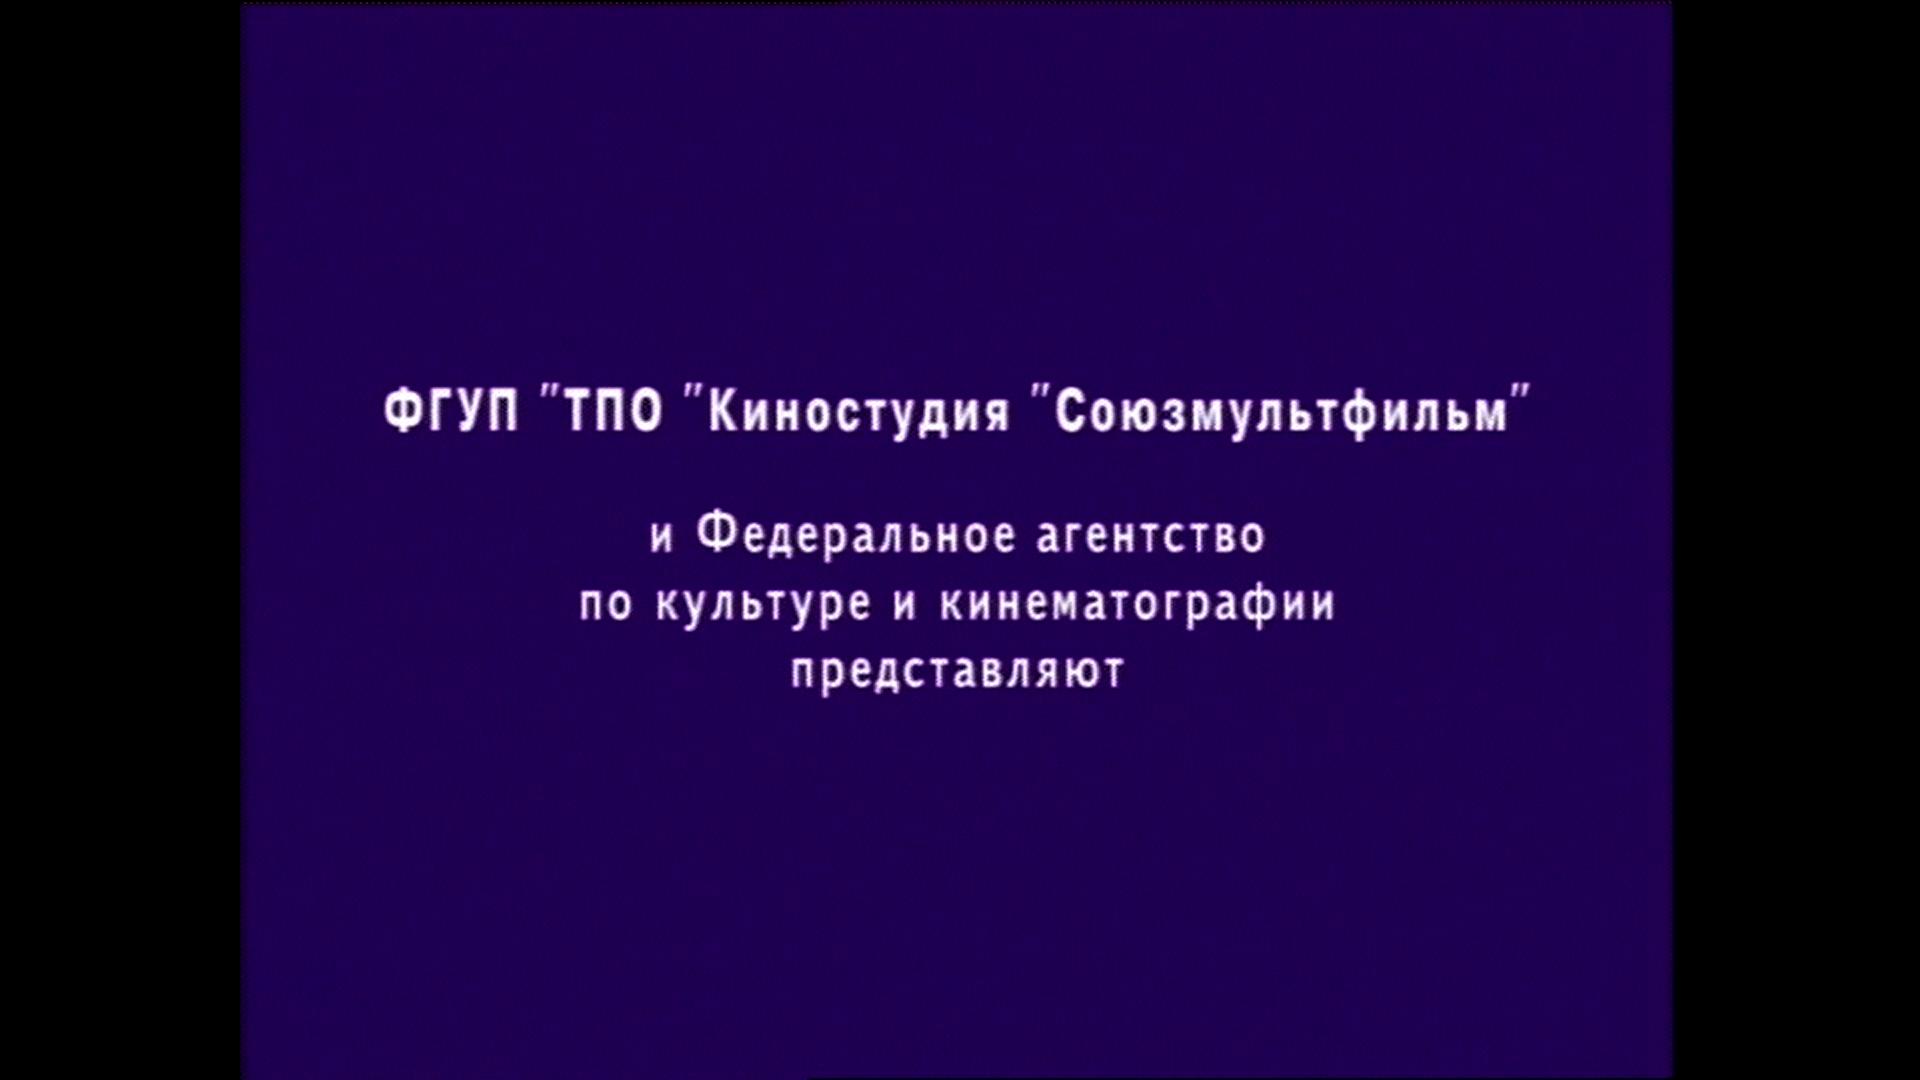 http://i4.imageban.ru/out/2012/09/01/24dec2f9a21079cd425ab46c12bf00d7.png